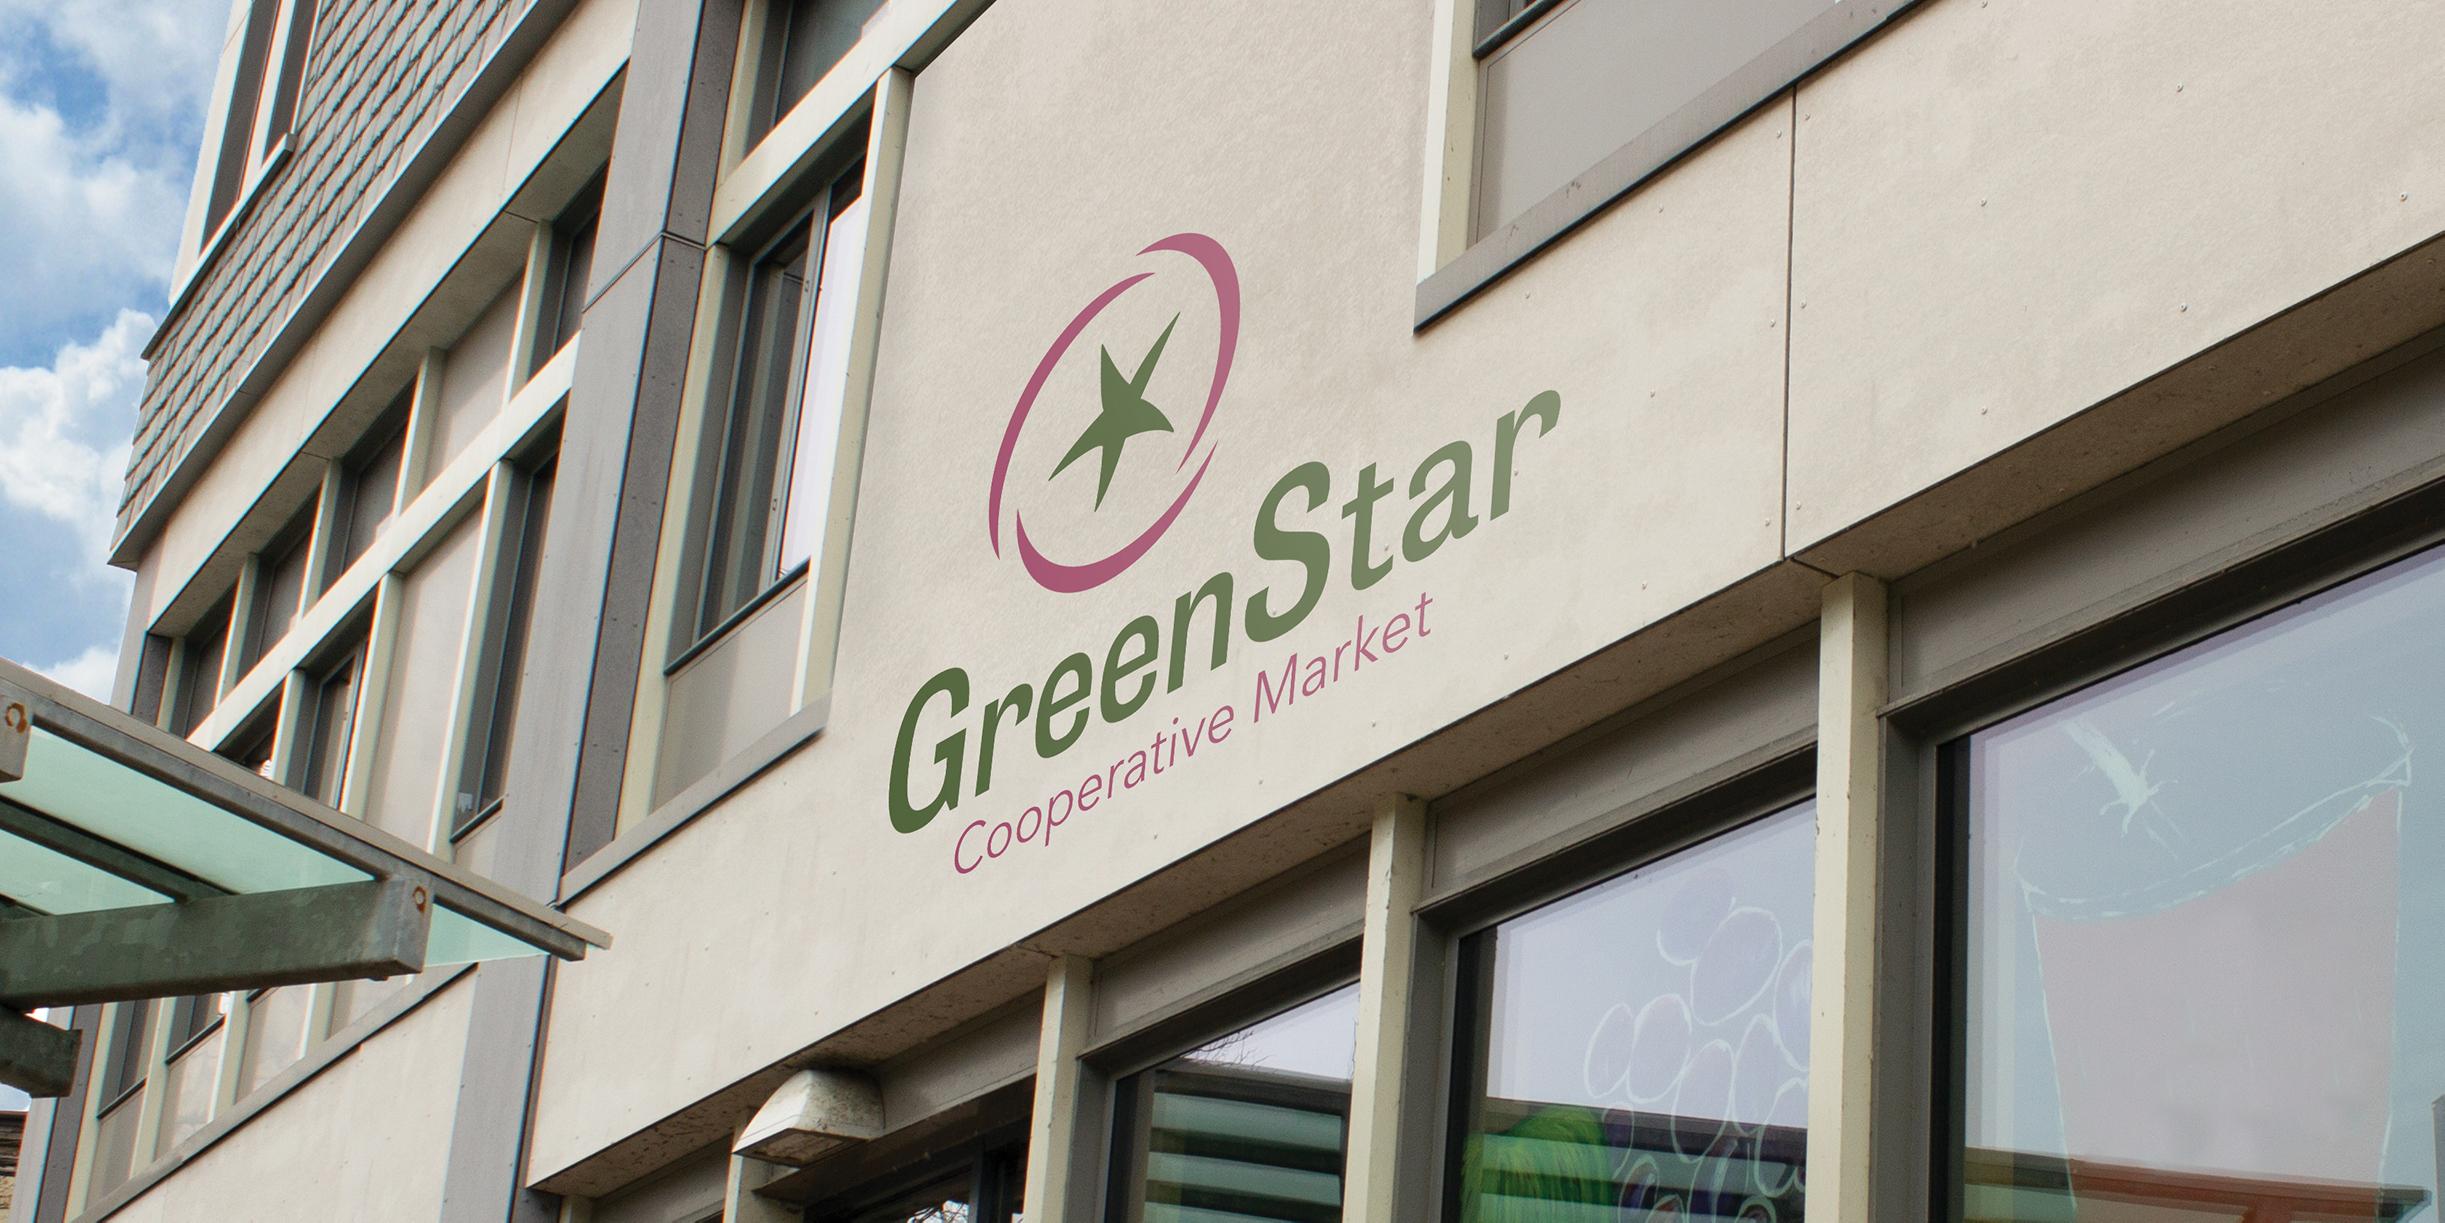 greenstar_redo_signage_16x8.jpg